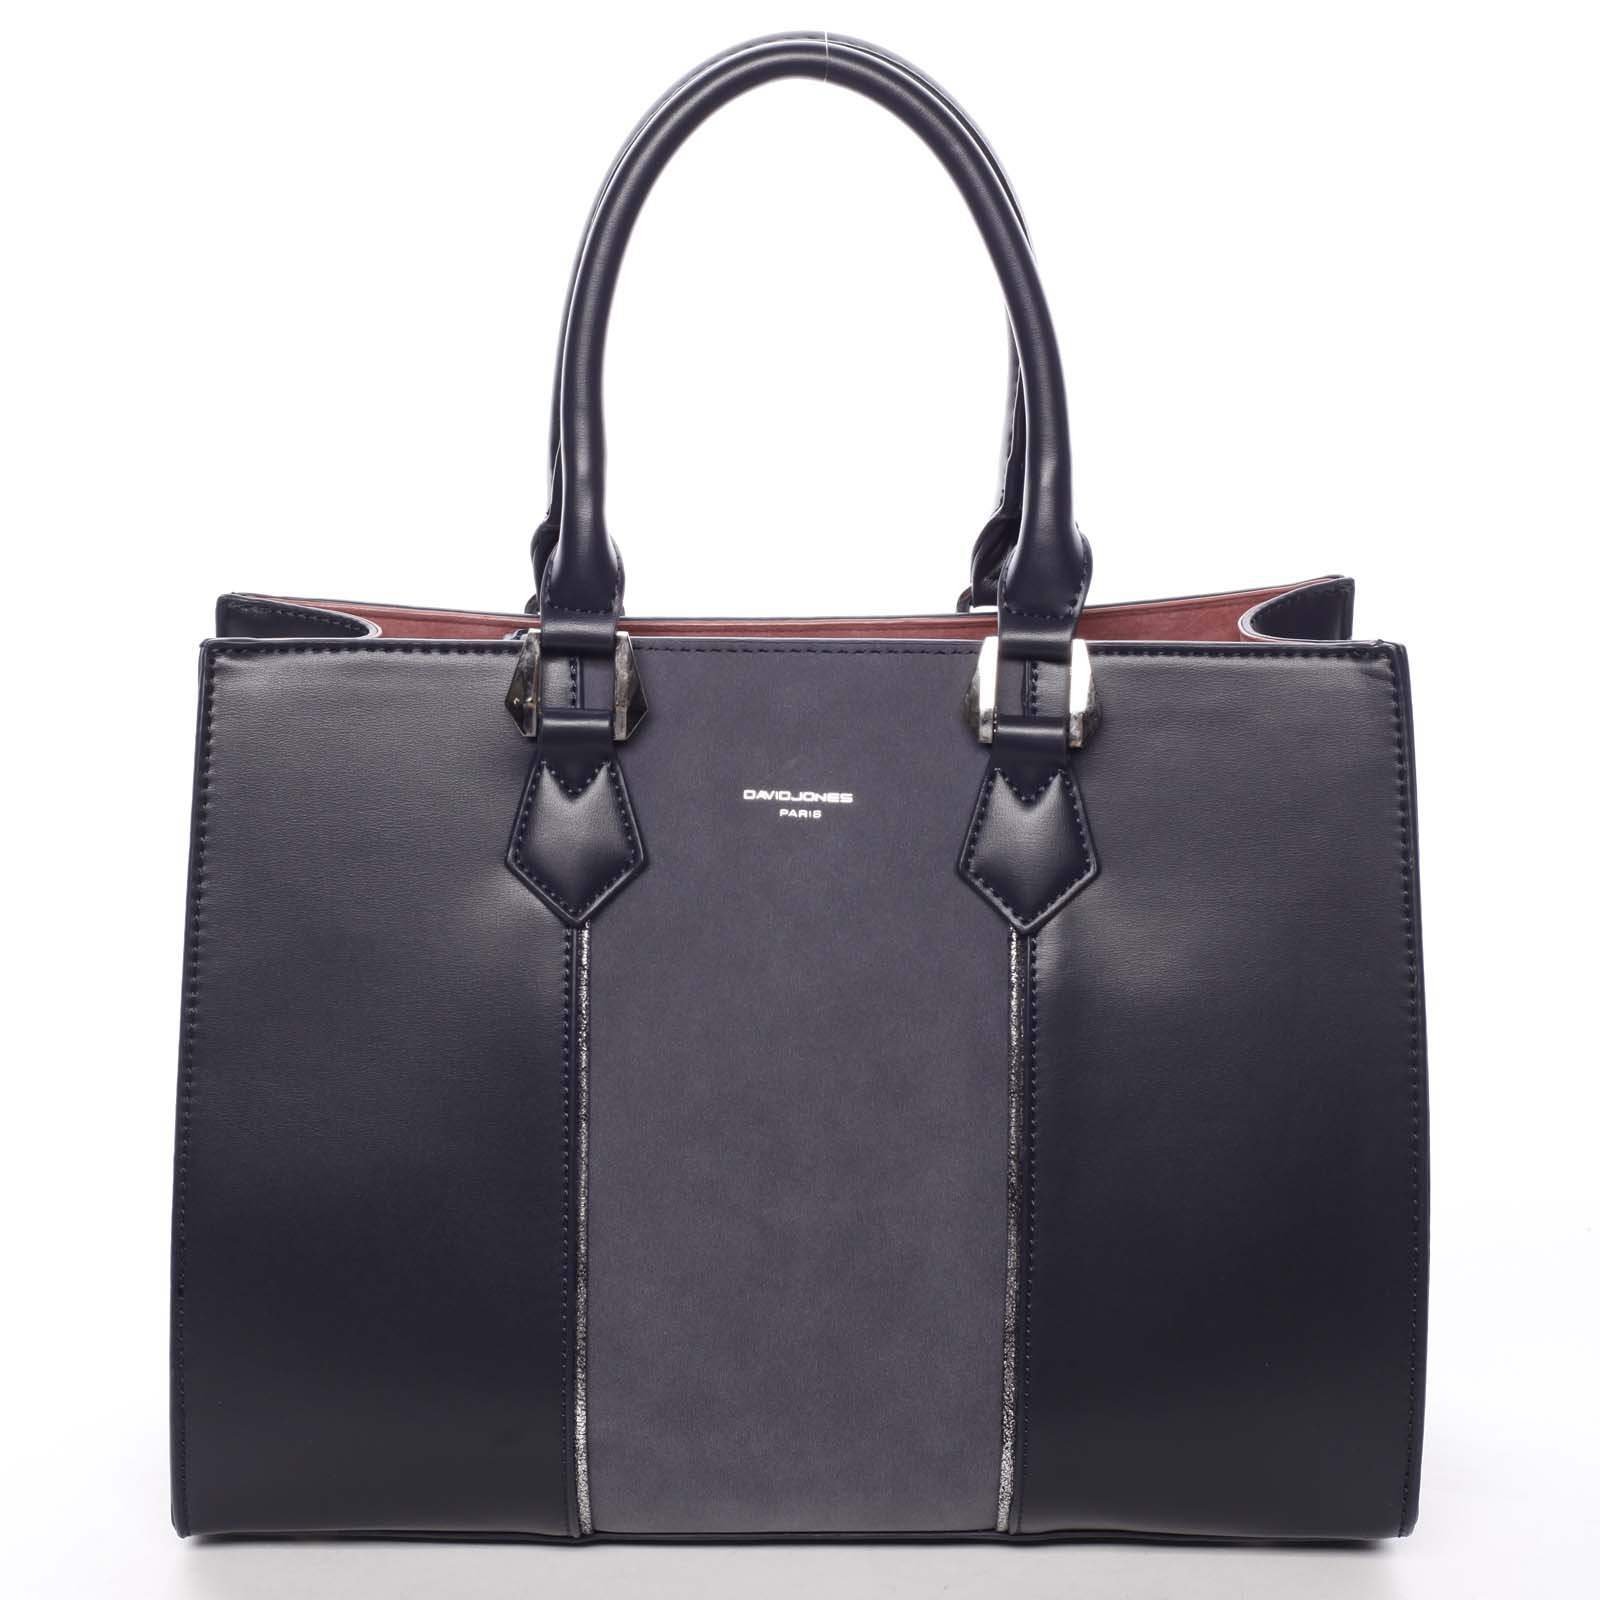 Elegantná dámska tmavomodrá kabelka do ruky - David Jones Zeruiah